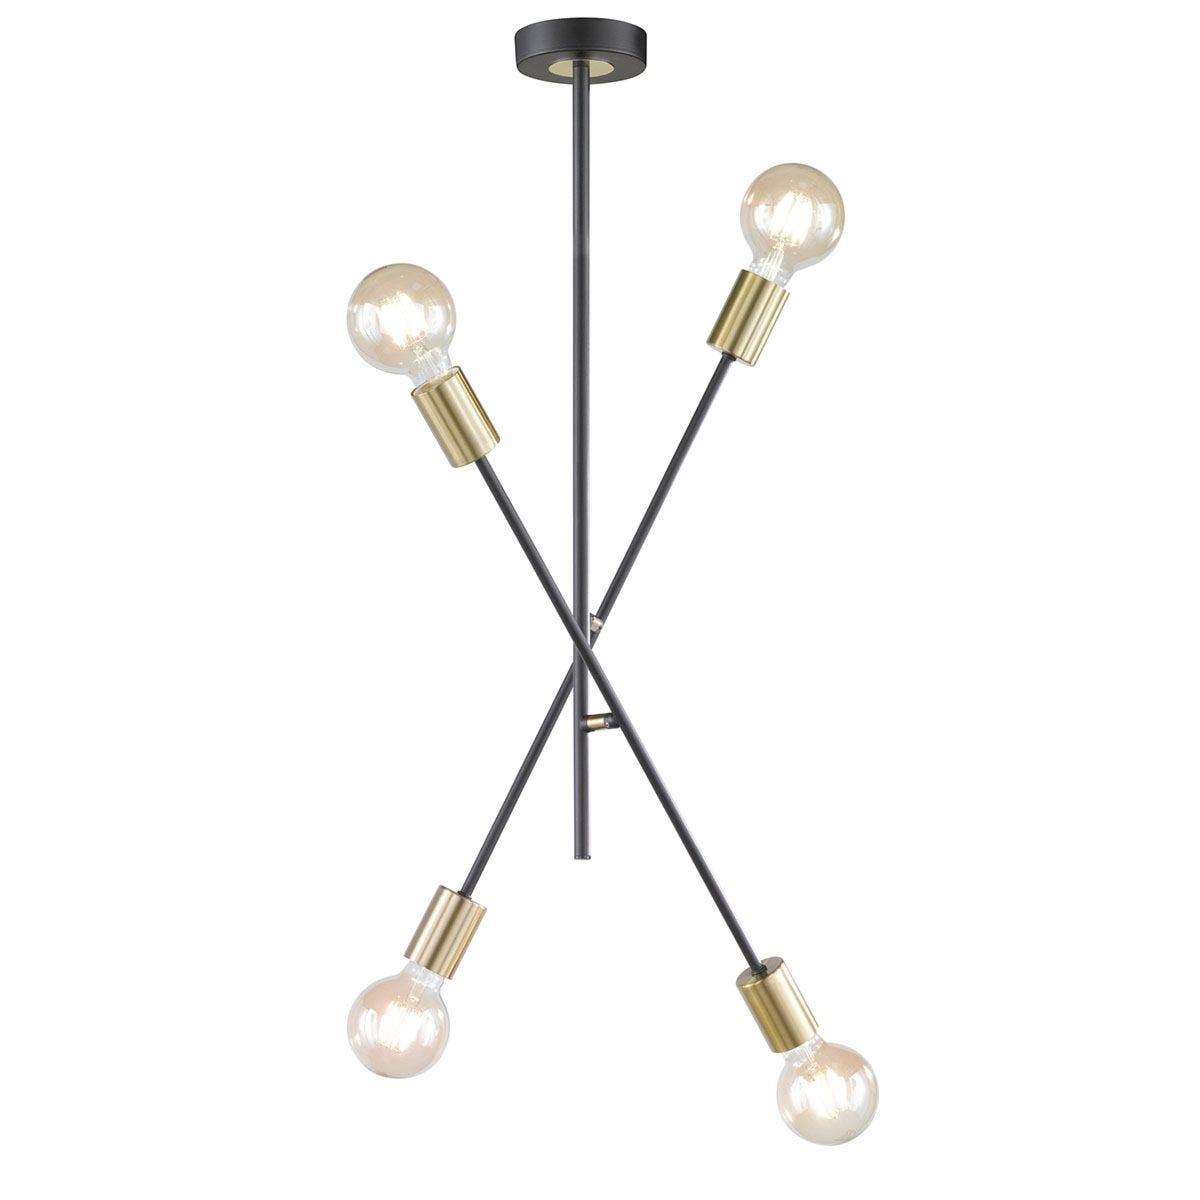 Wofi Tanil 4-Light Ceiling Lamp Single Shaft - Black & Gold